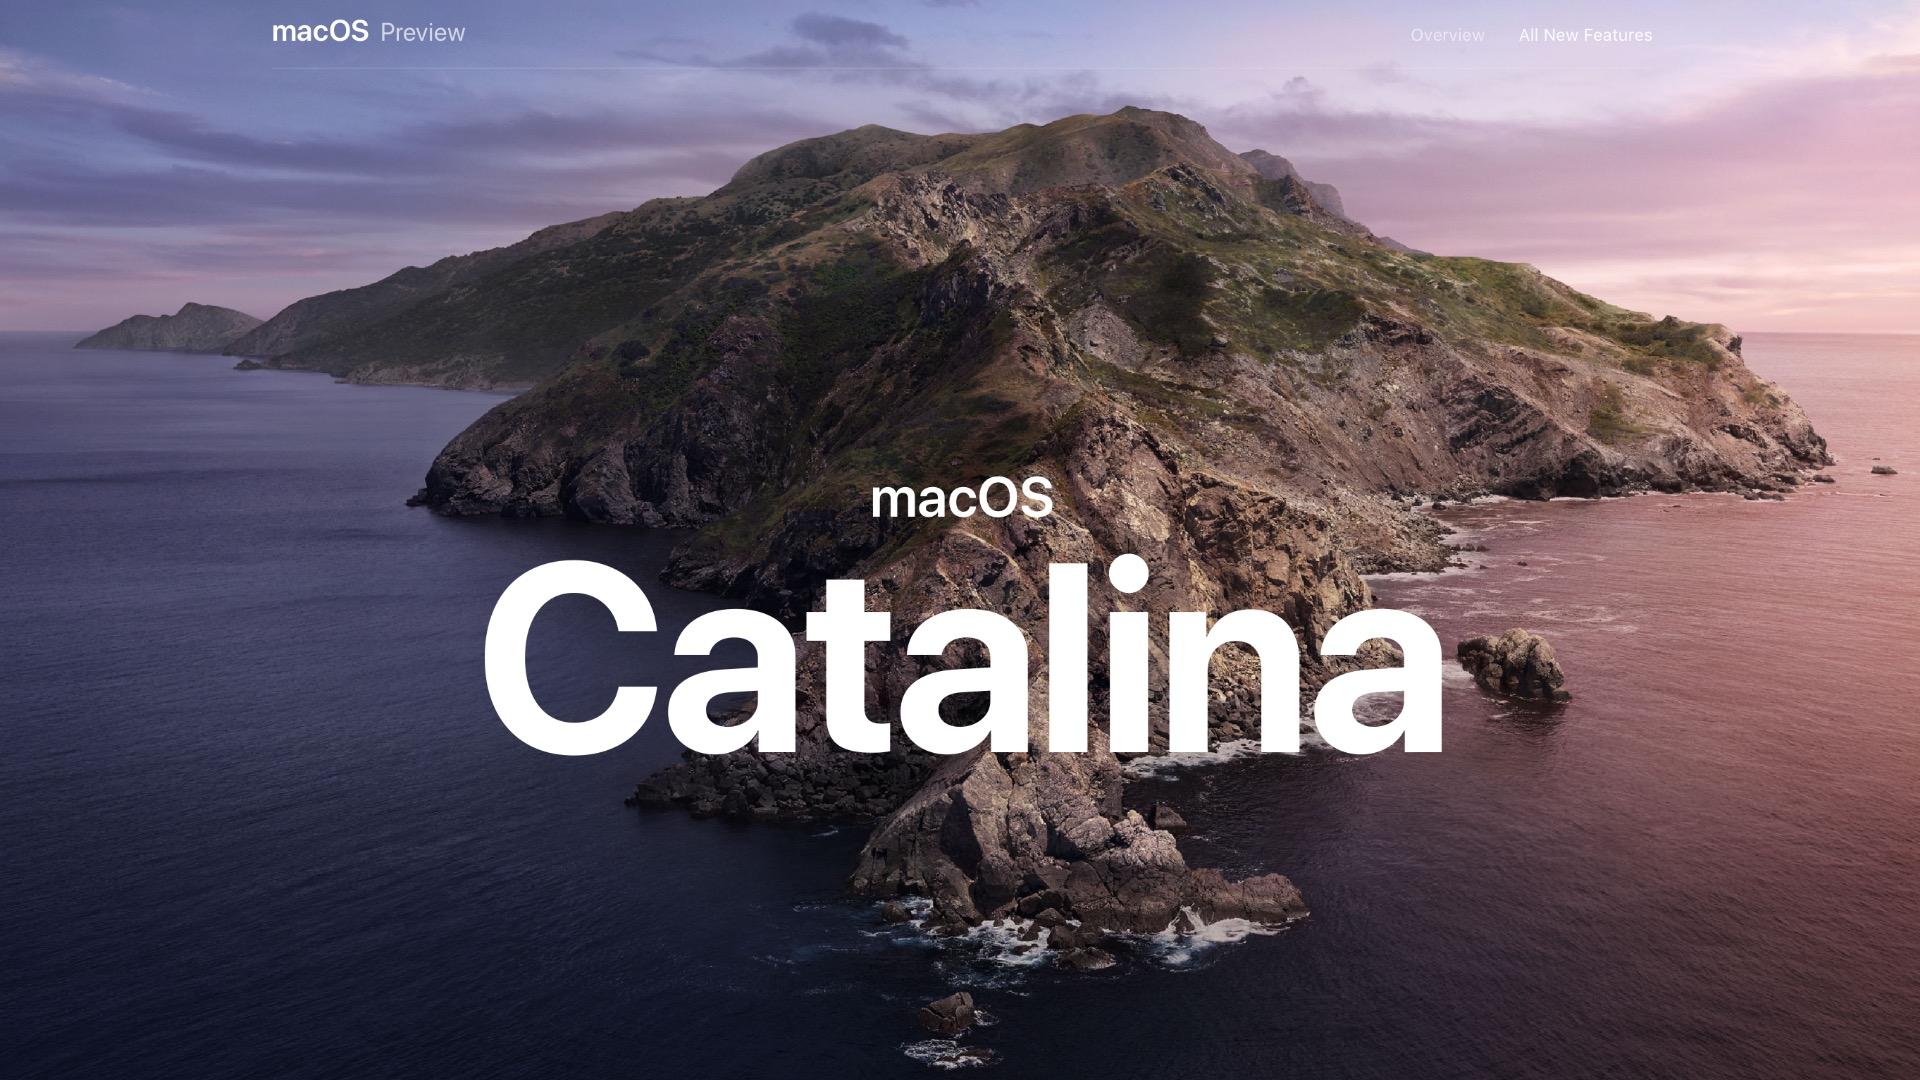 macOS v10.15 Catalina